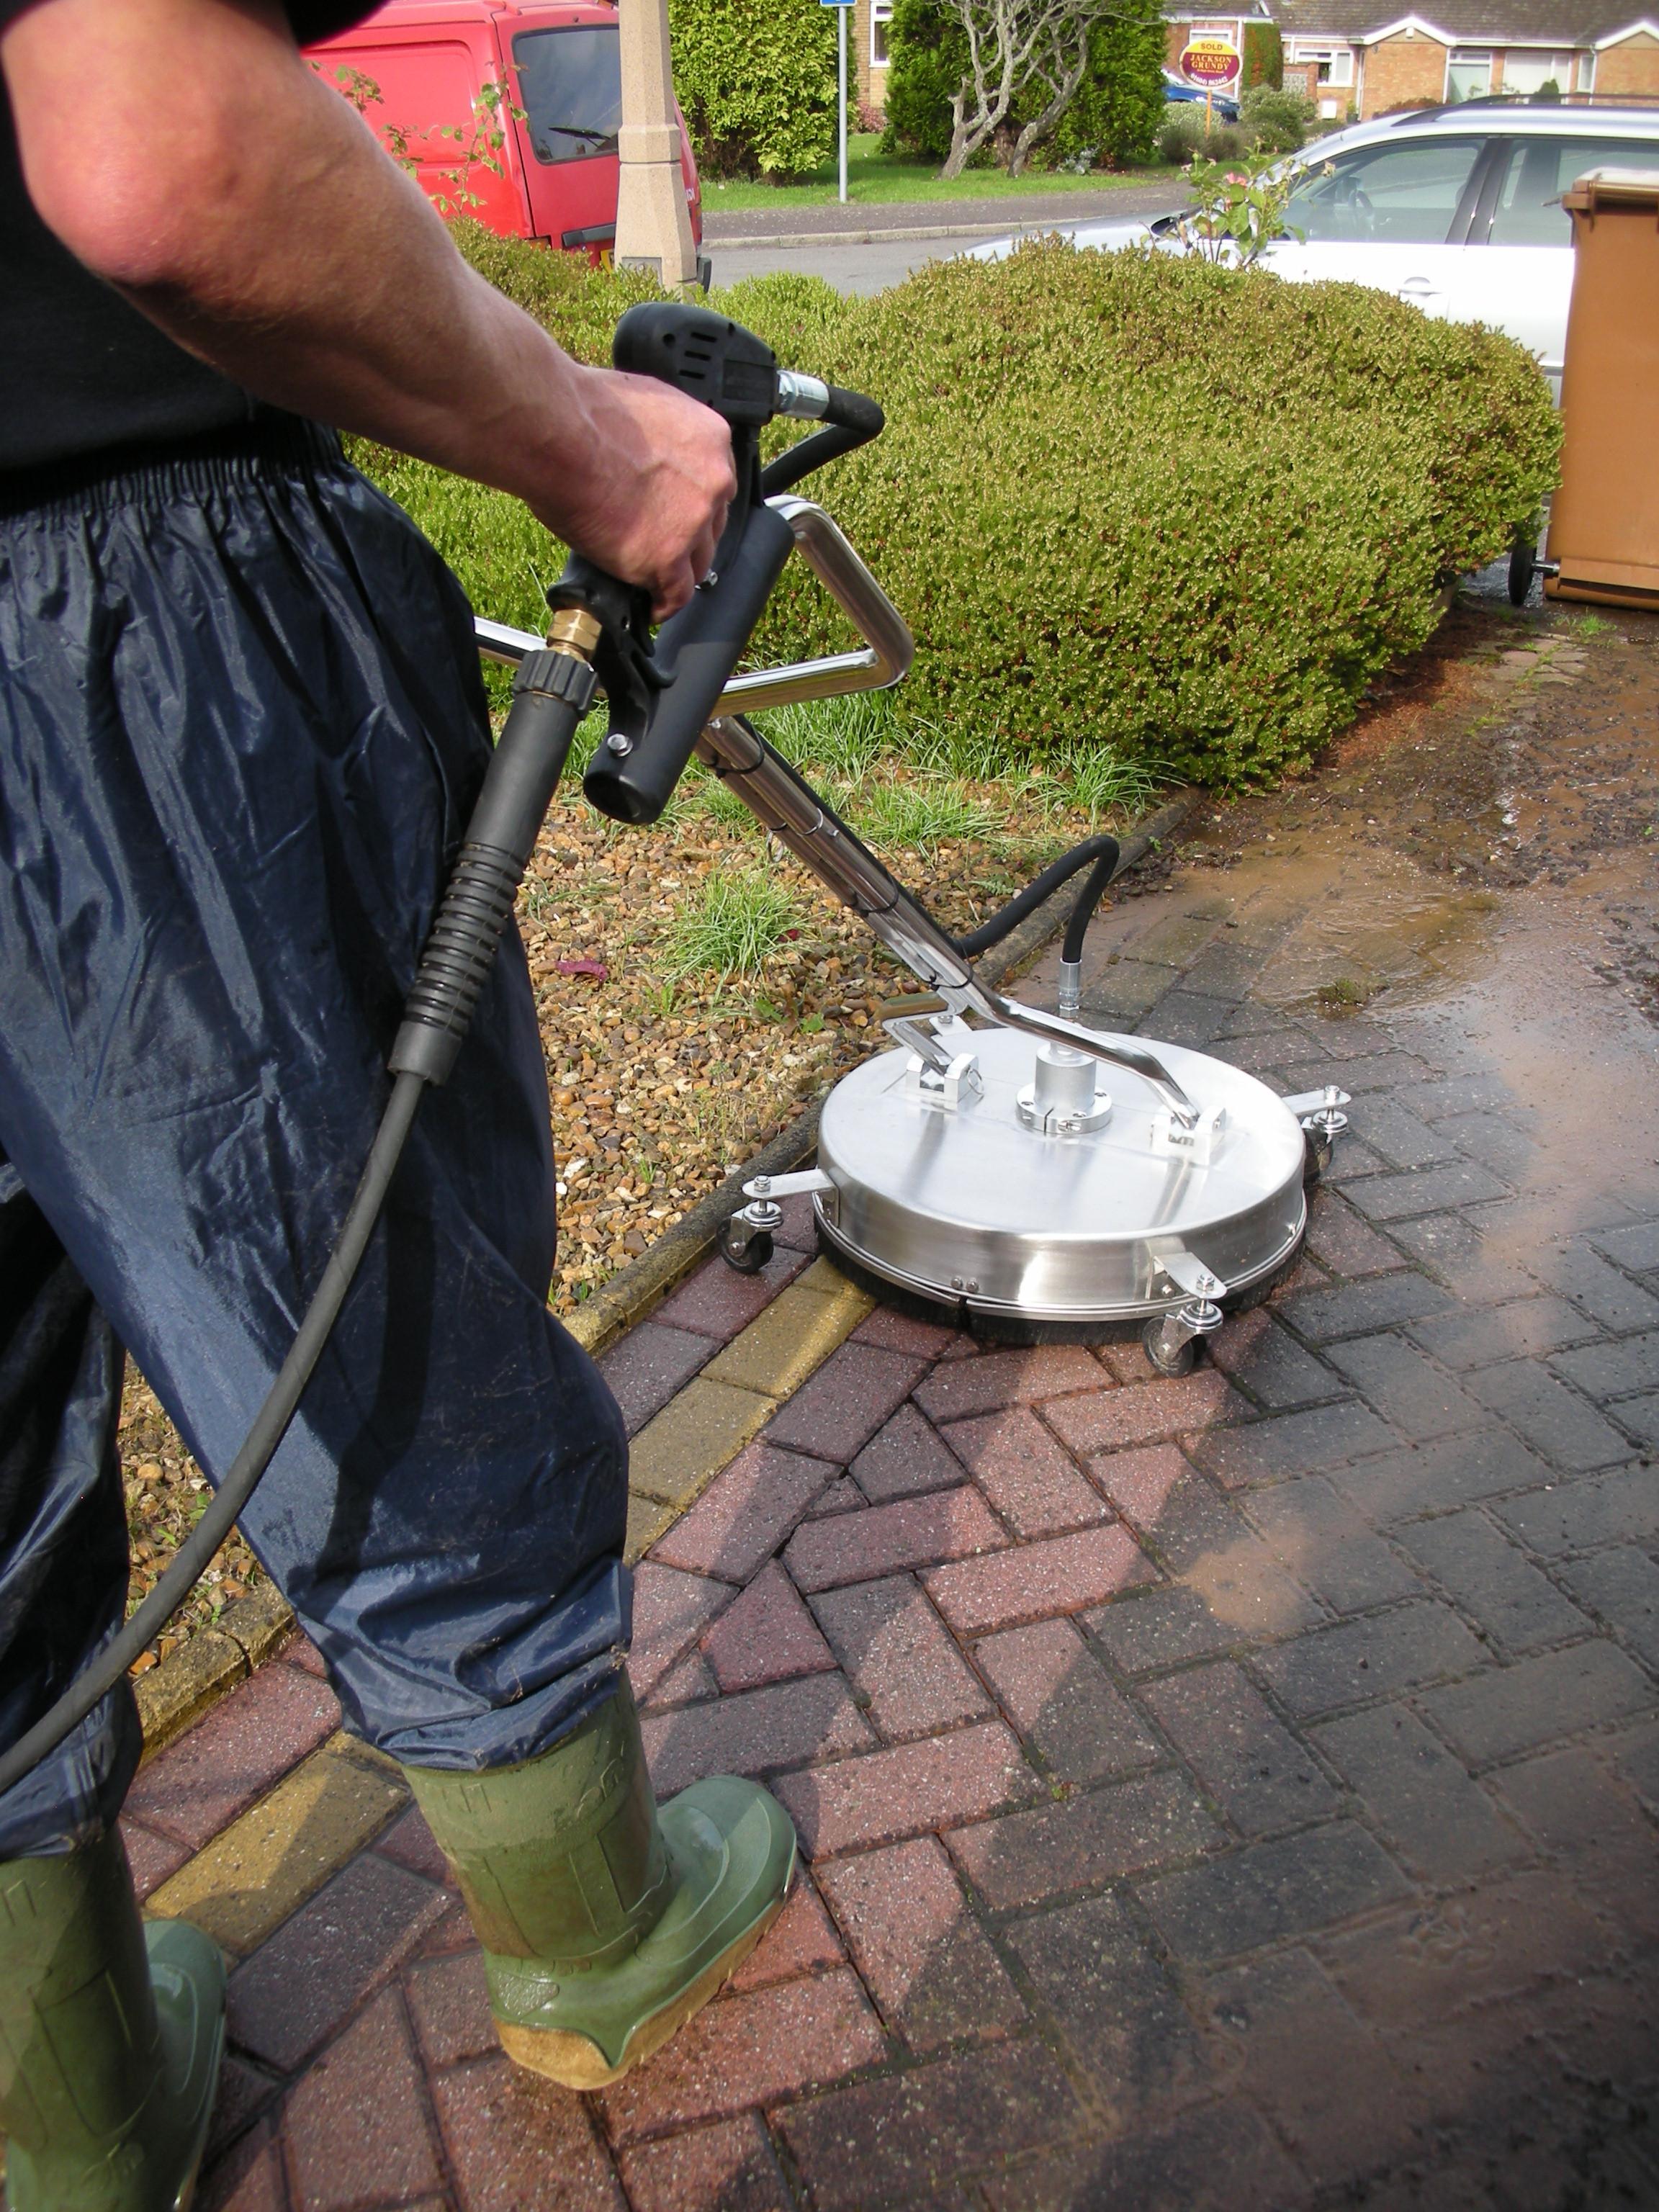 High powered pressure washing